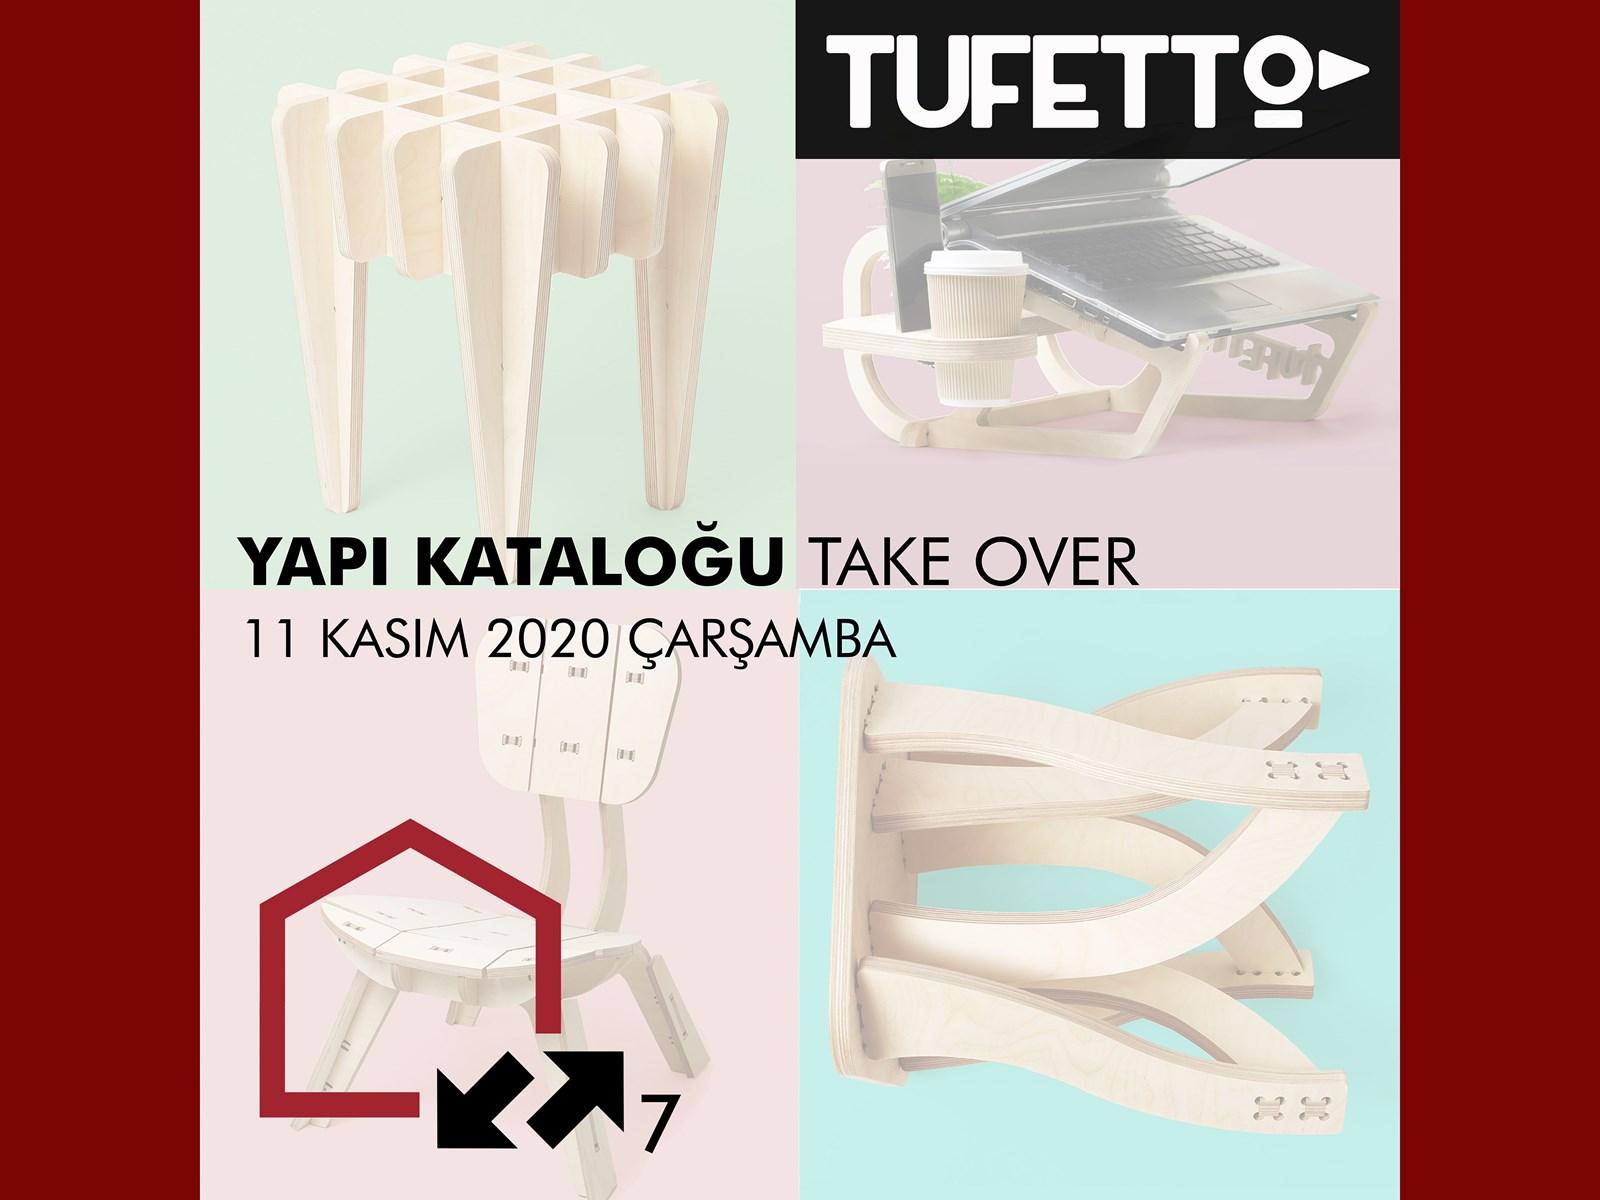 TakeOver #7 - Tufetto